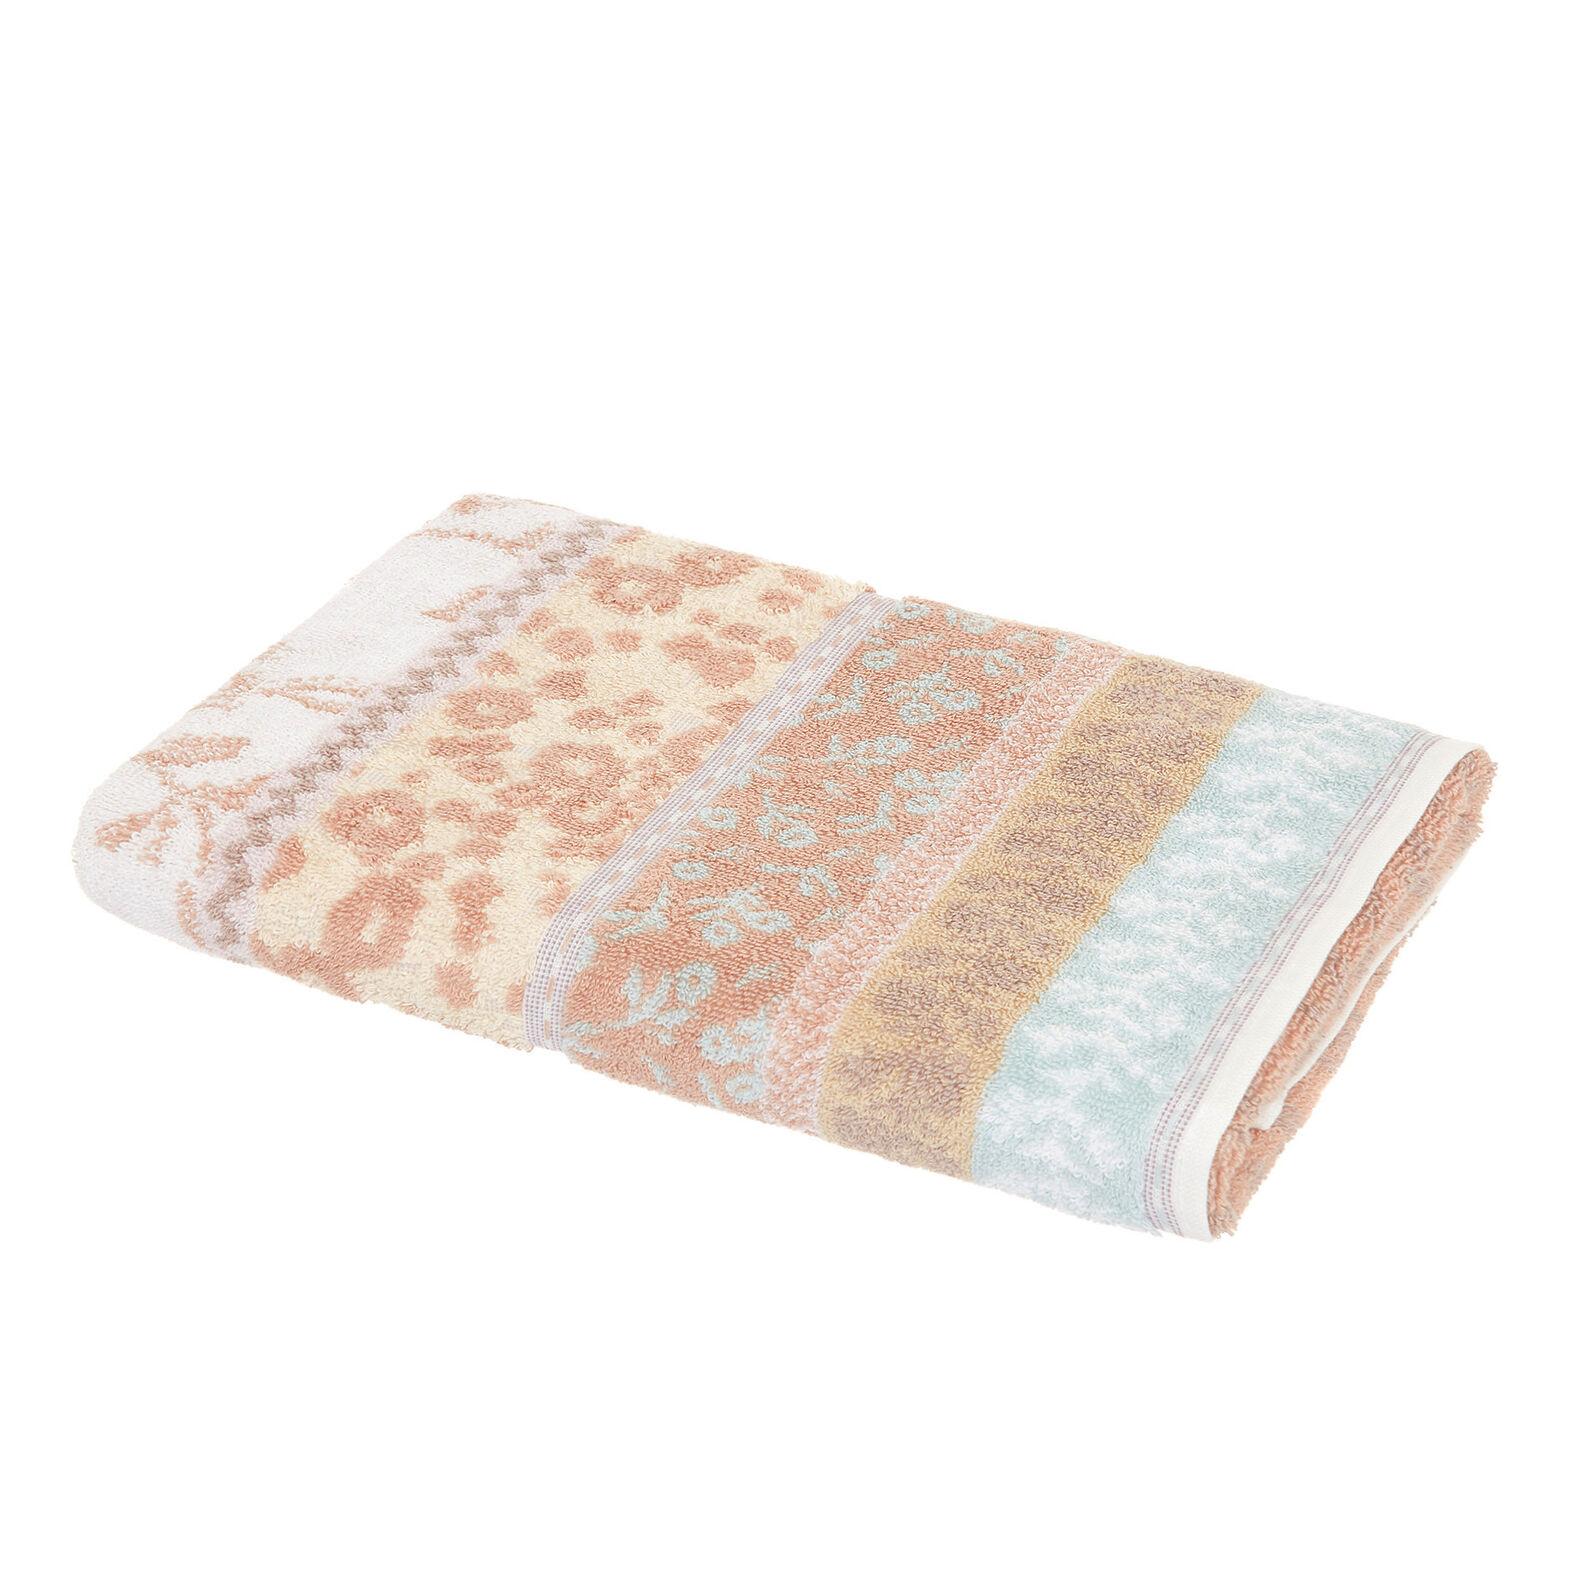 Cotton towel with floral jacquard design